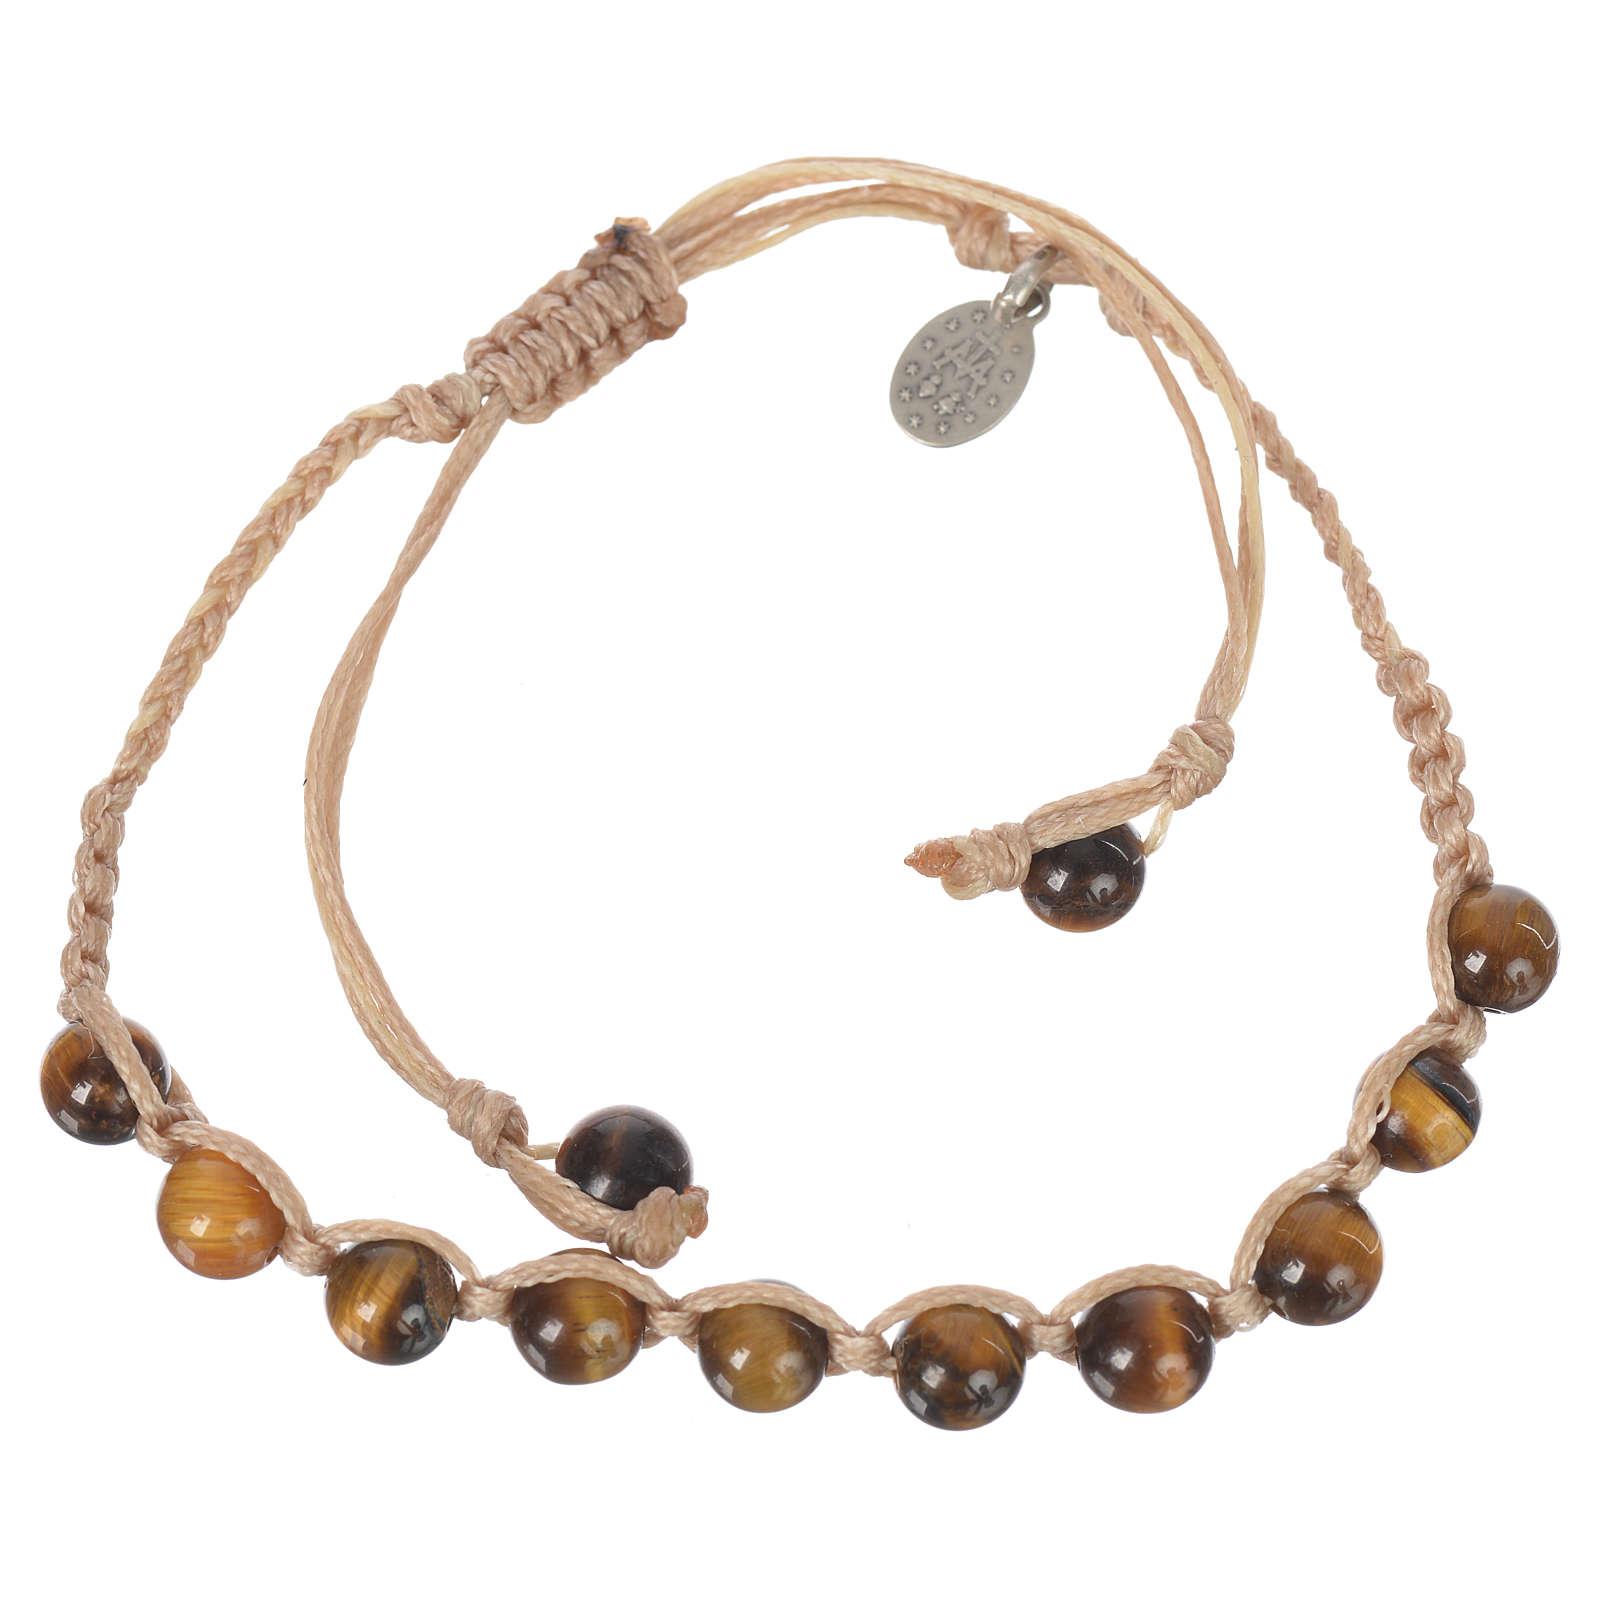 Bracelet Oeil de Tigre Méd. Miraculeuse Arg 925 cordon sable 4